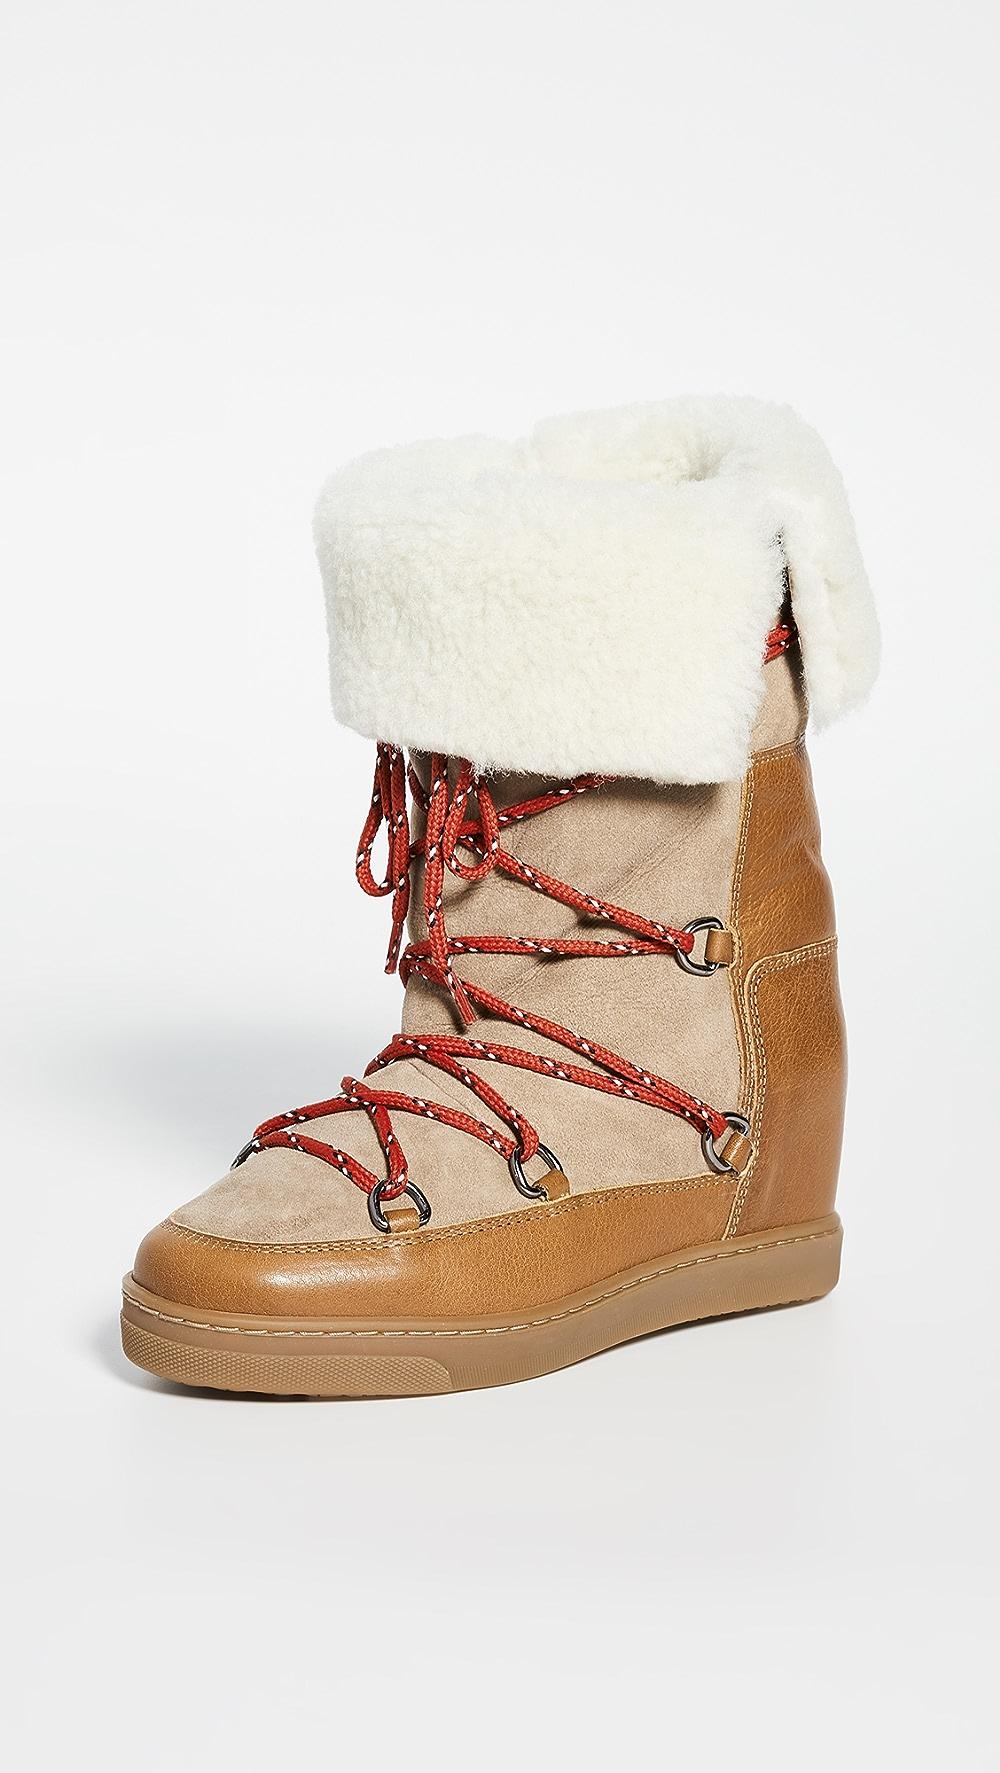 Faithful Isabel Marant - Nowly Boots Buy One Get One Free